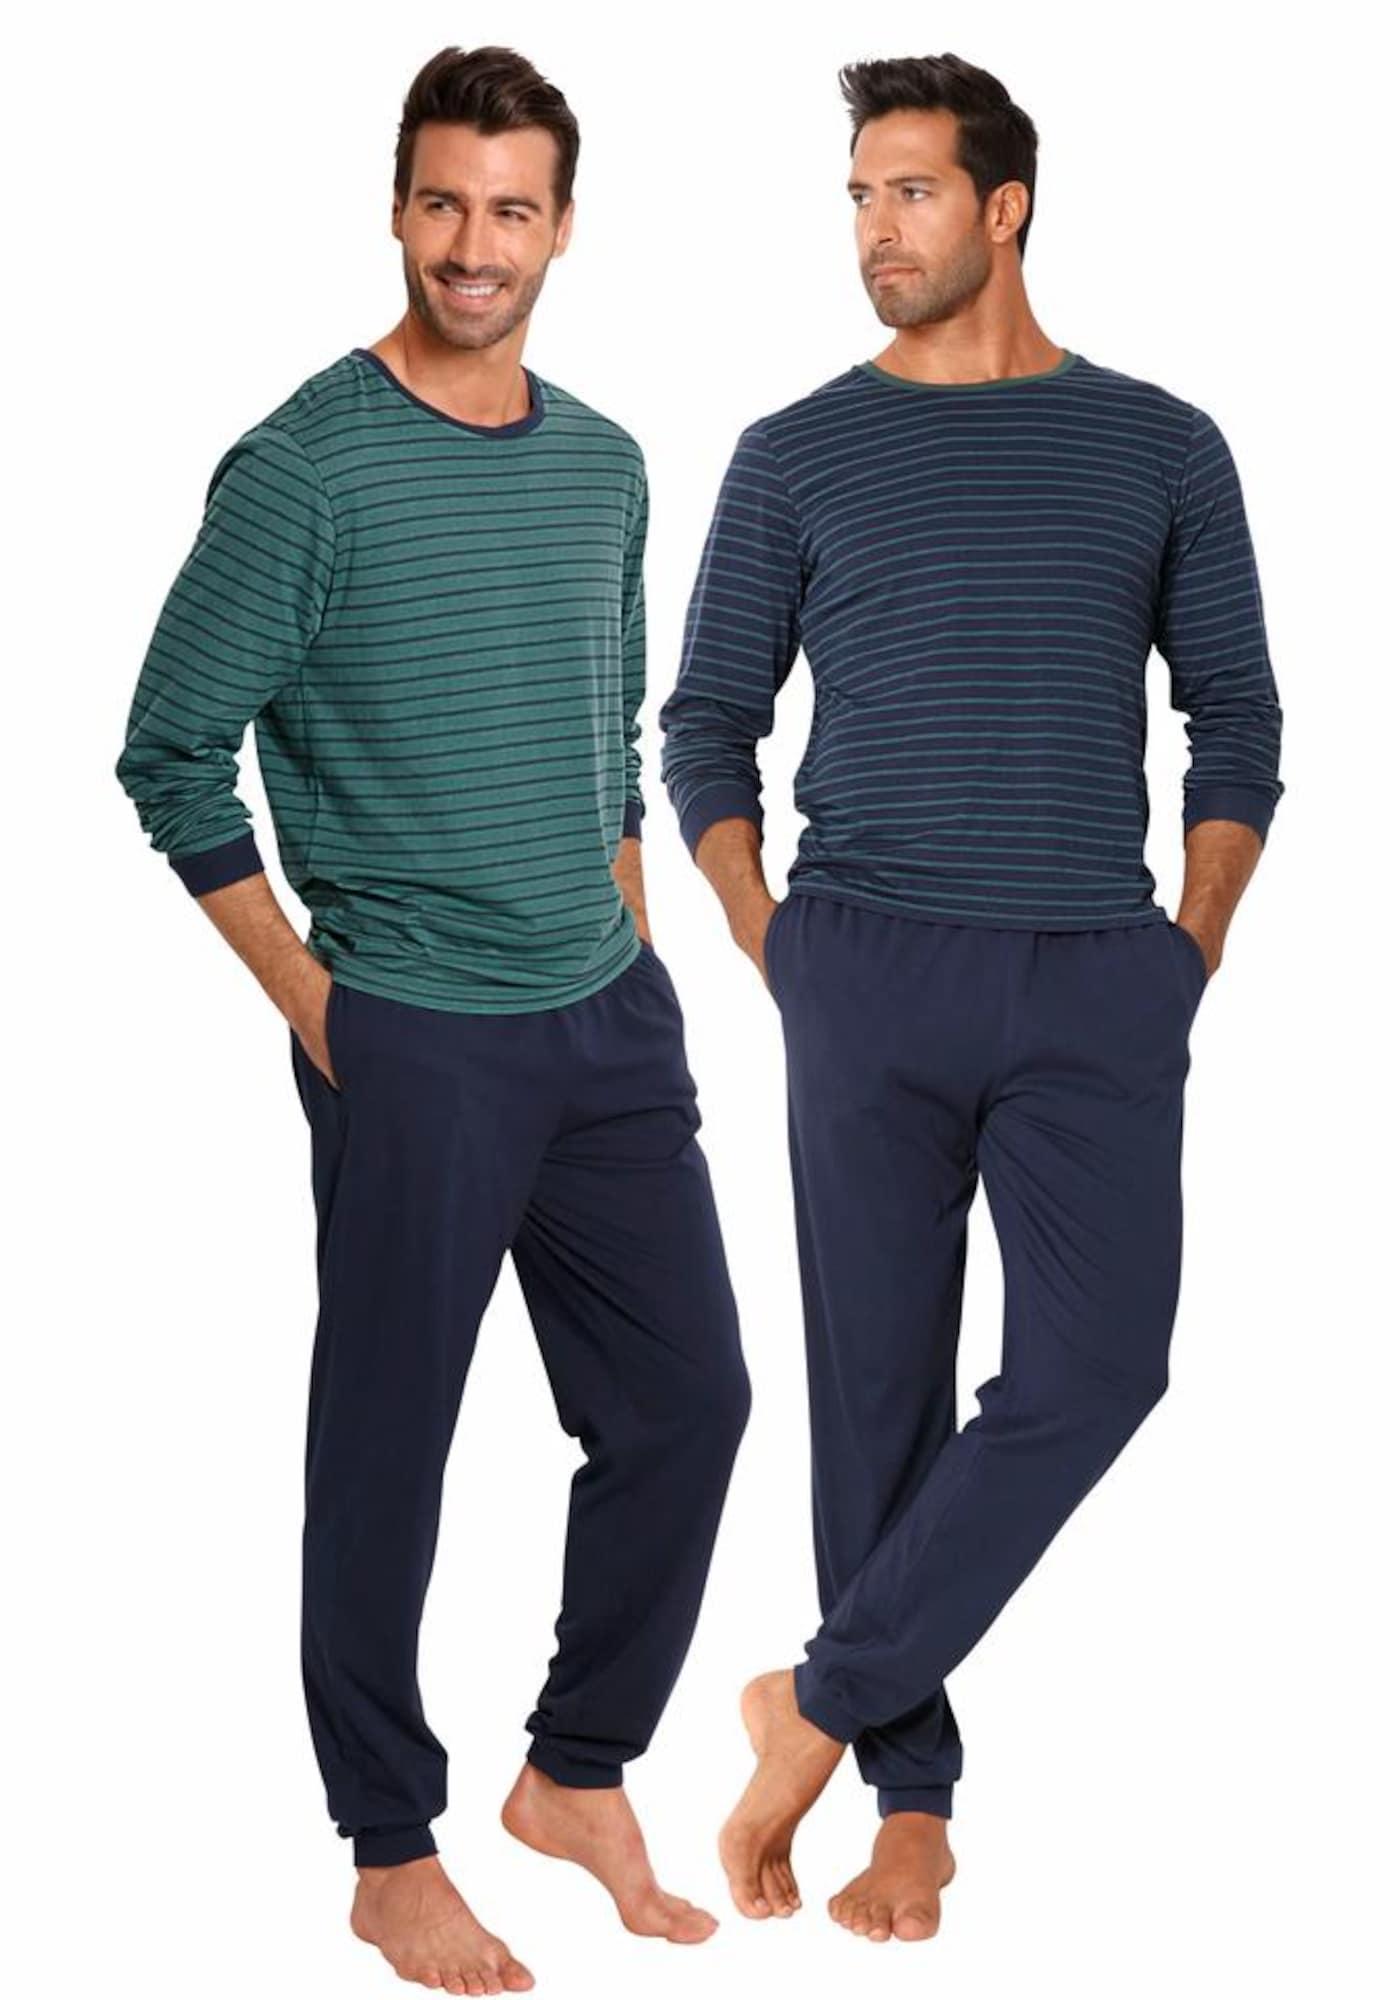 Herren Pyjamas lang | Bekleidung > Wäsche > Nachtwäsche | Petrol | LE JOGGER